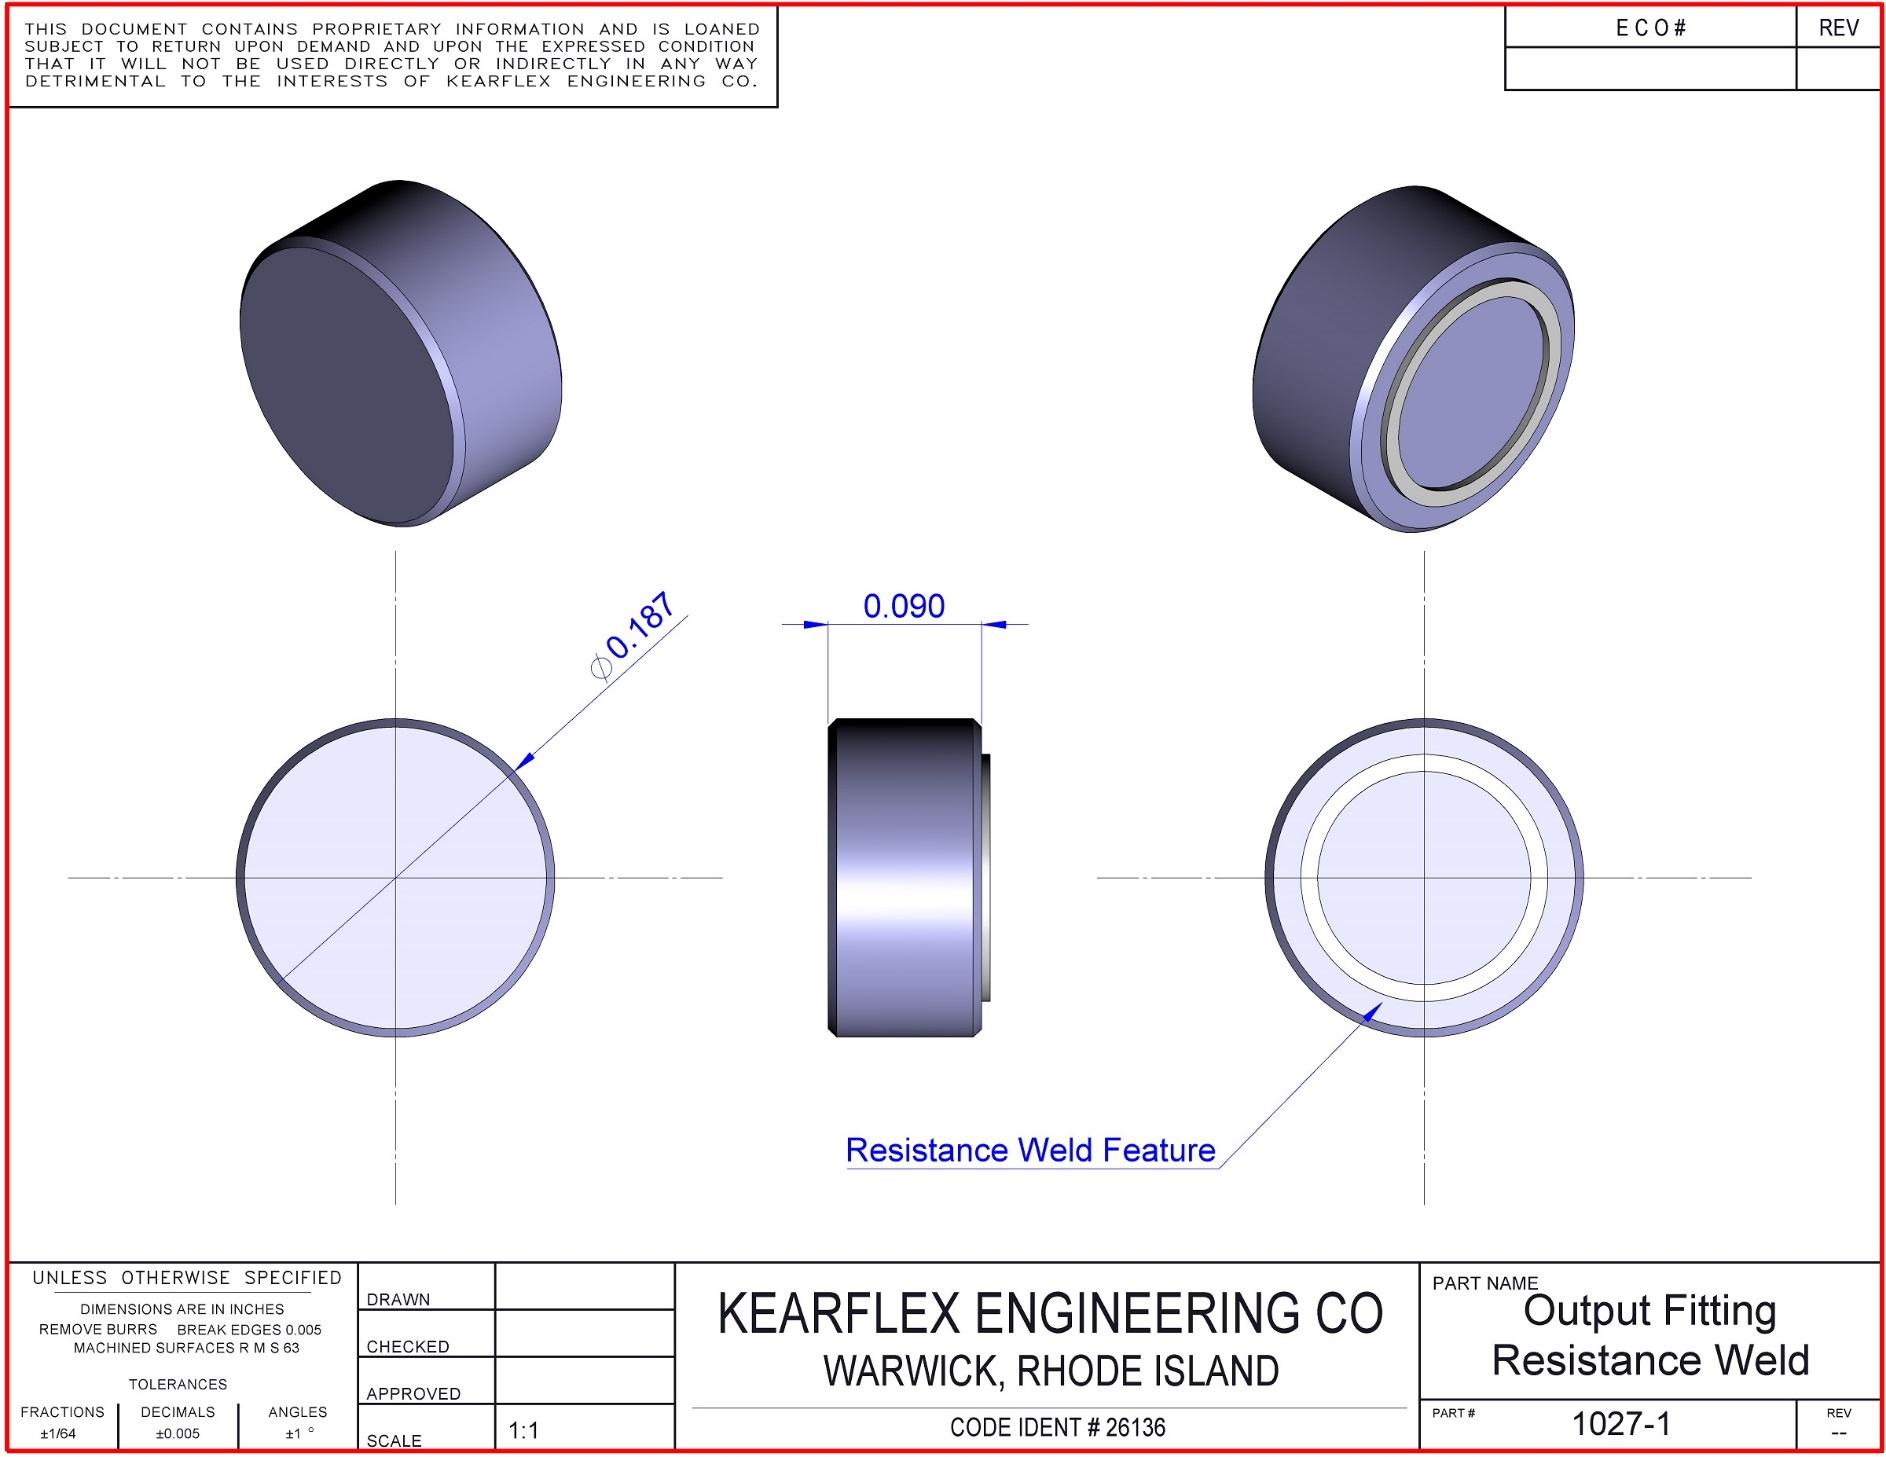 Sample Fittings Kearflex Engineering Resistance Welding Diagram Output Fitting Weld